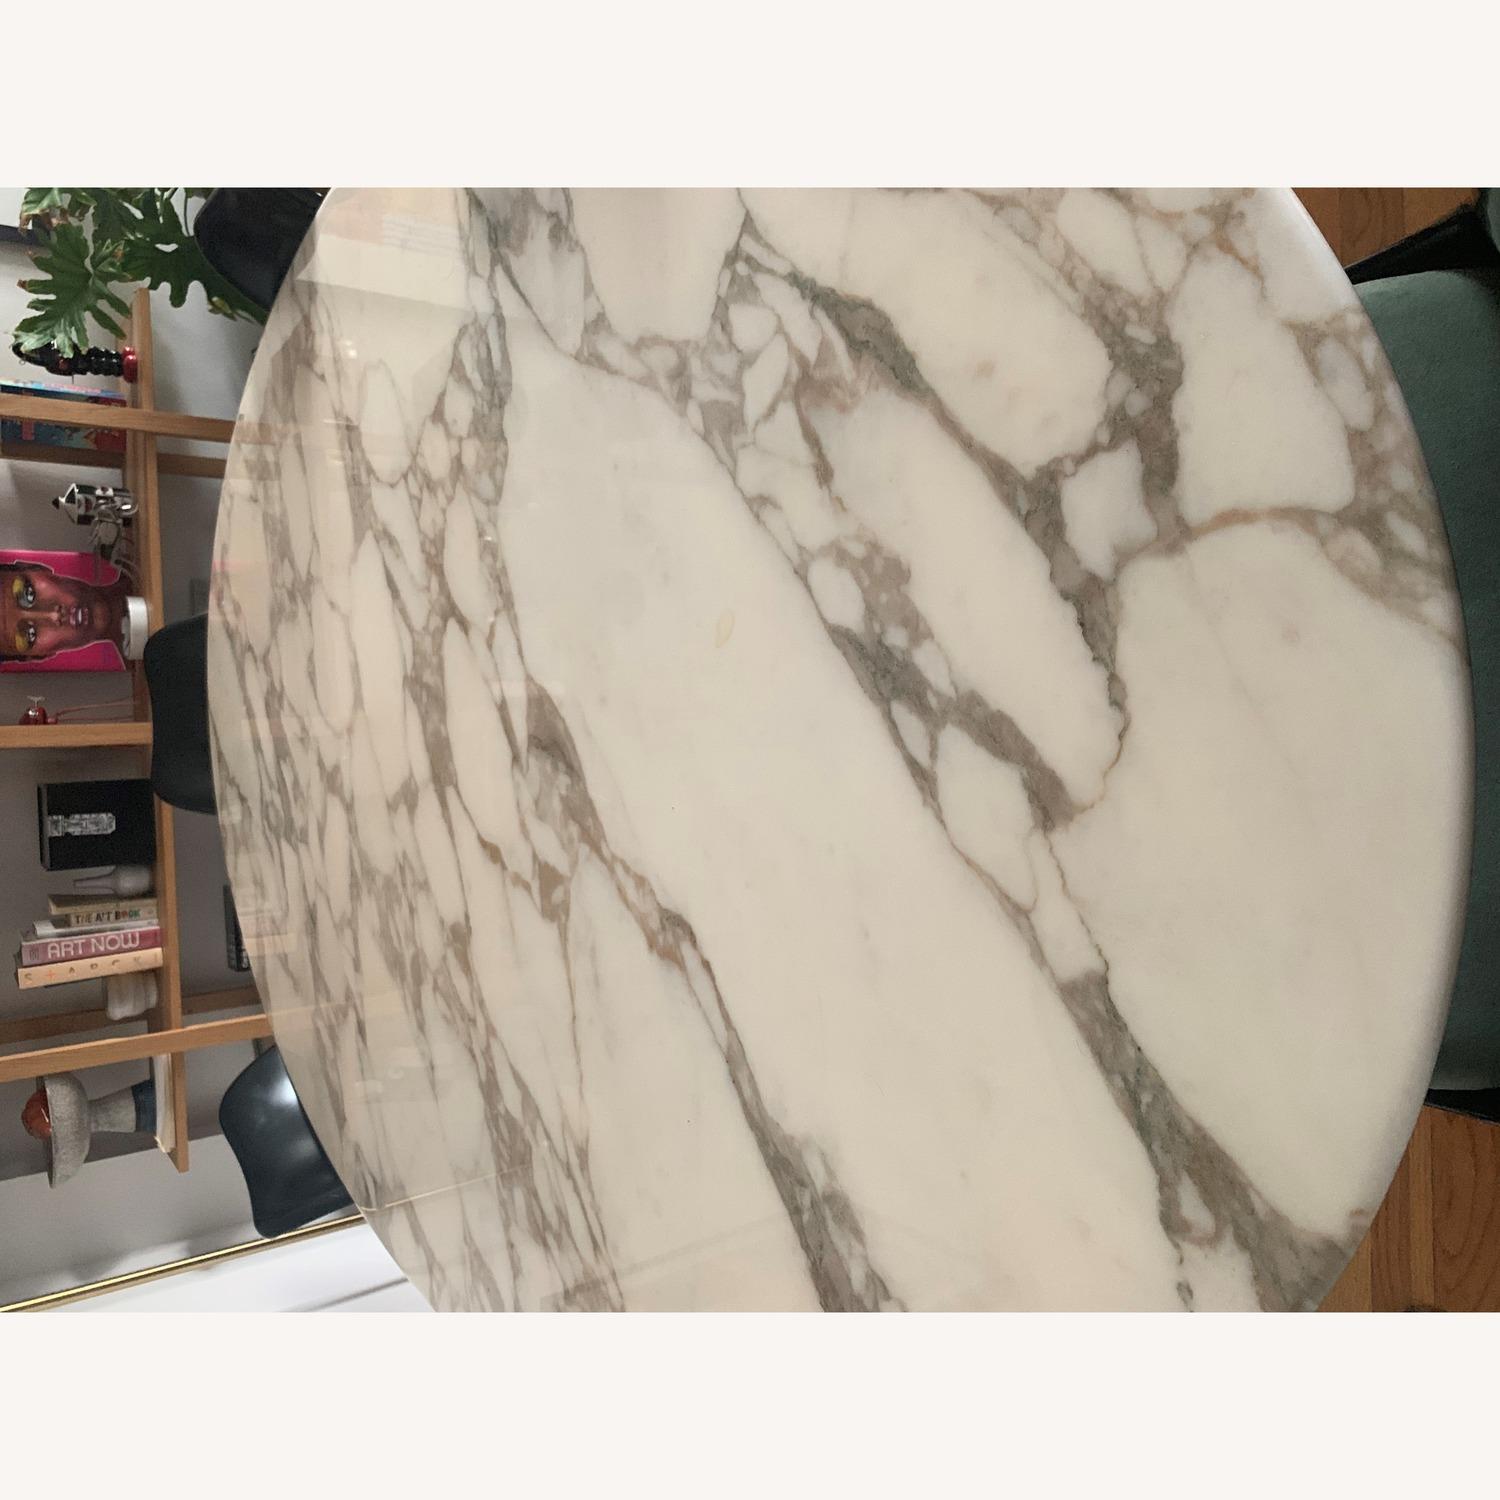 Knoll Saarinen Tulip Dining Table w/ Calacatta Marble Top - image-7